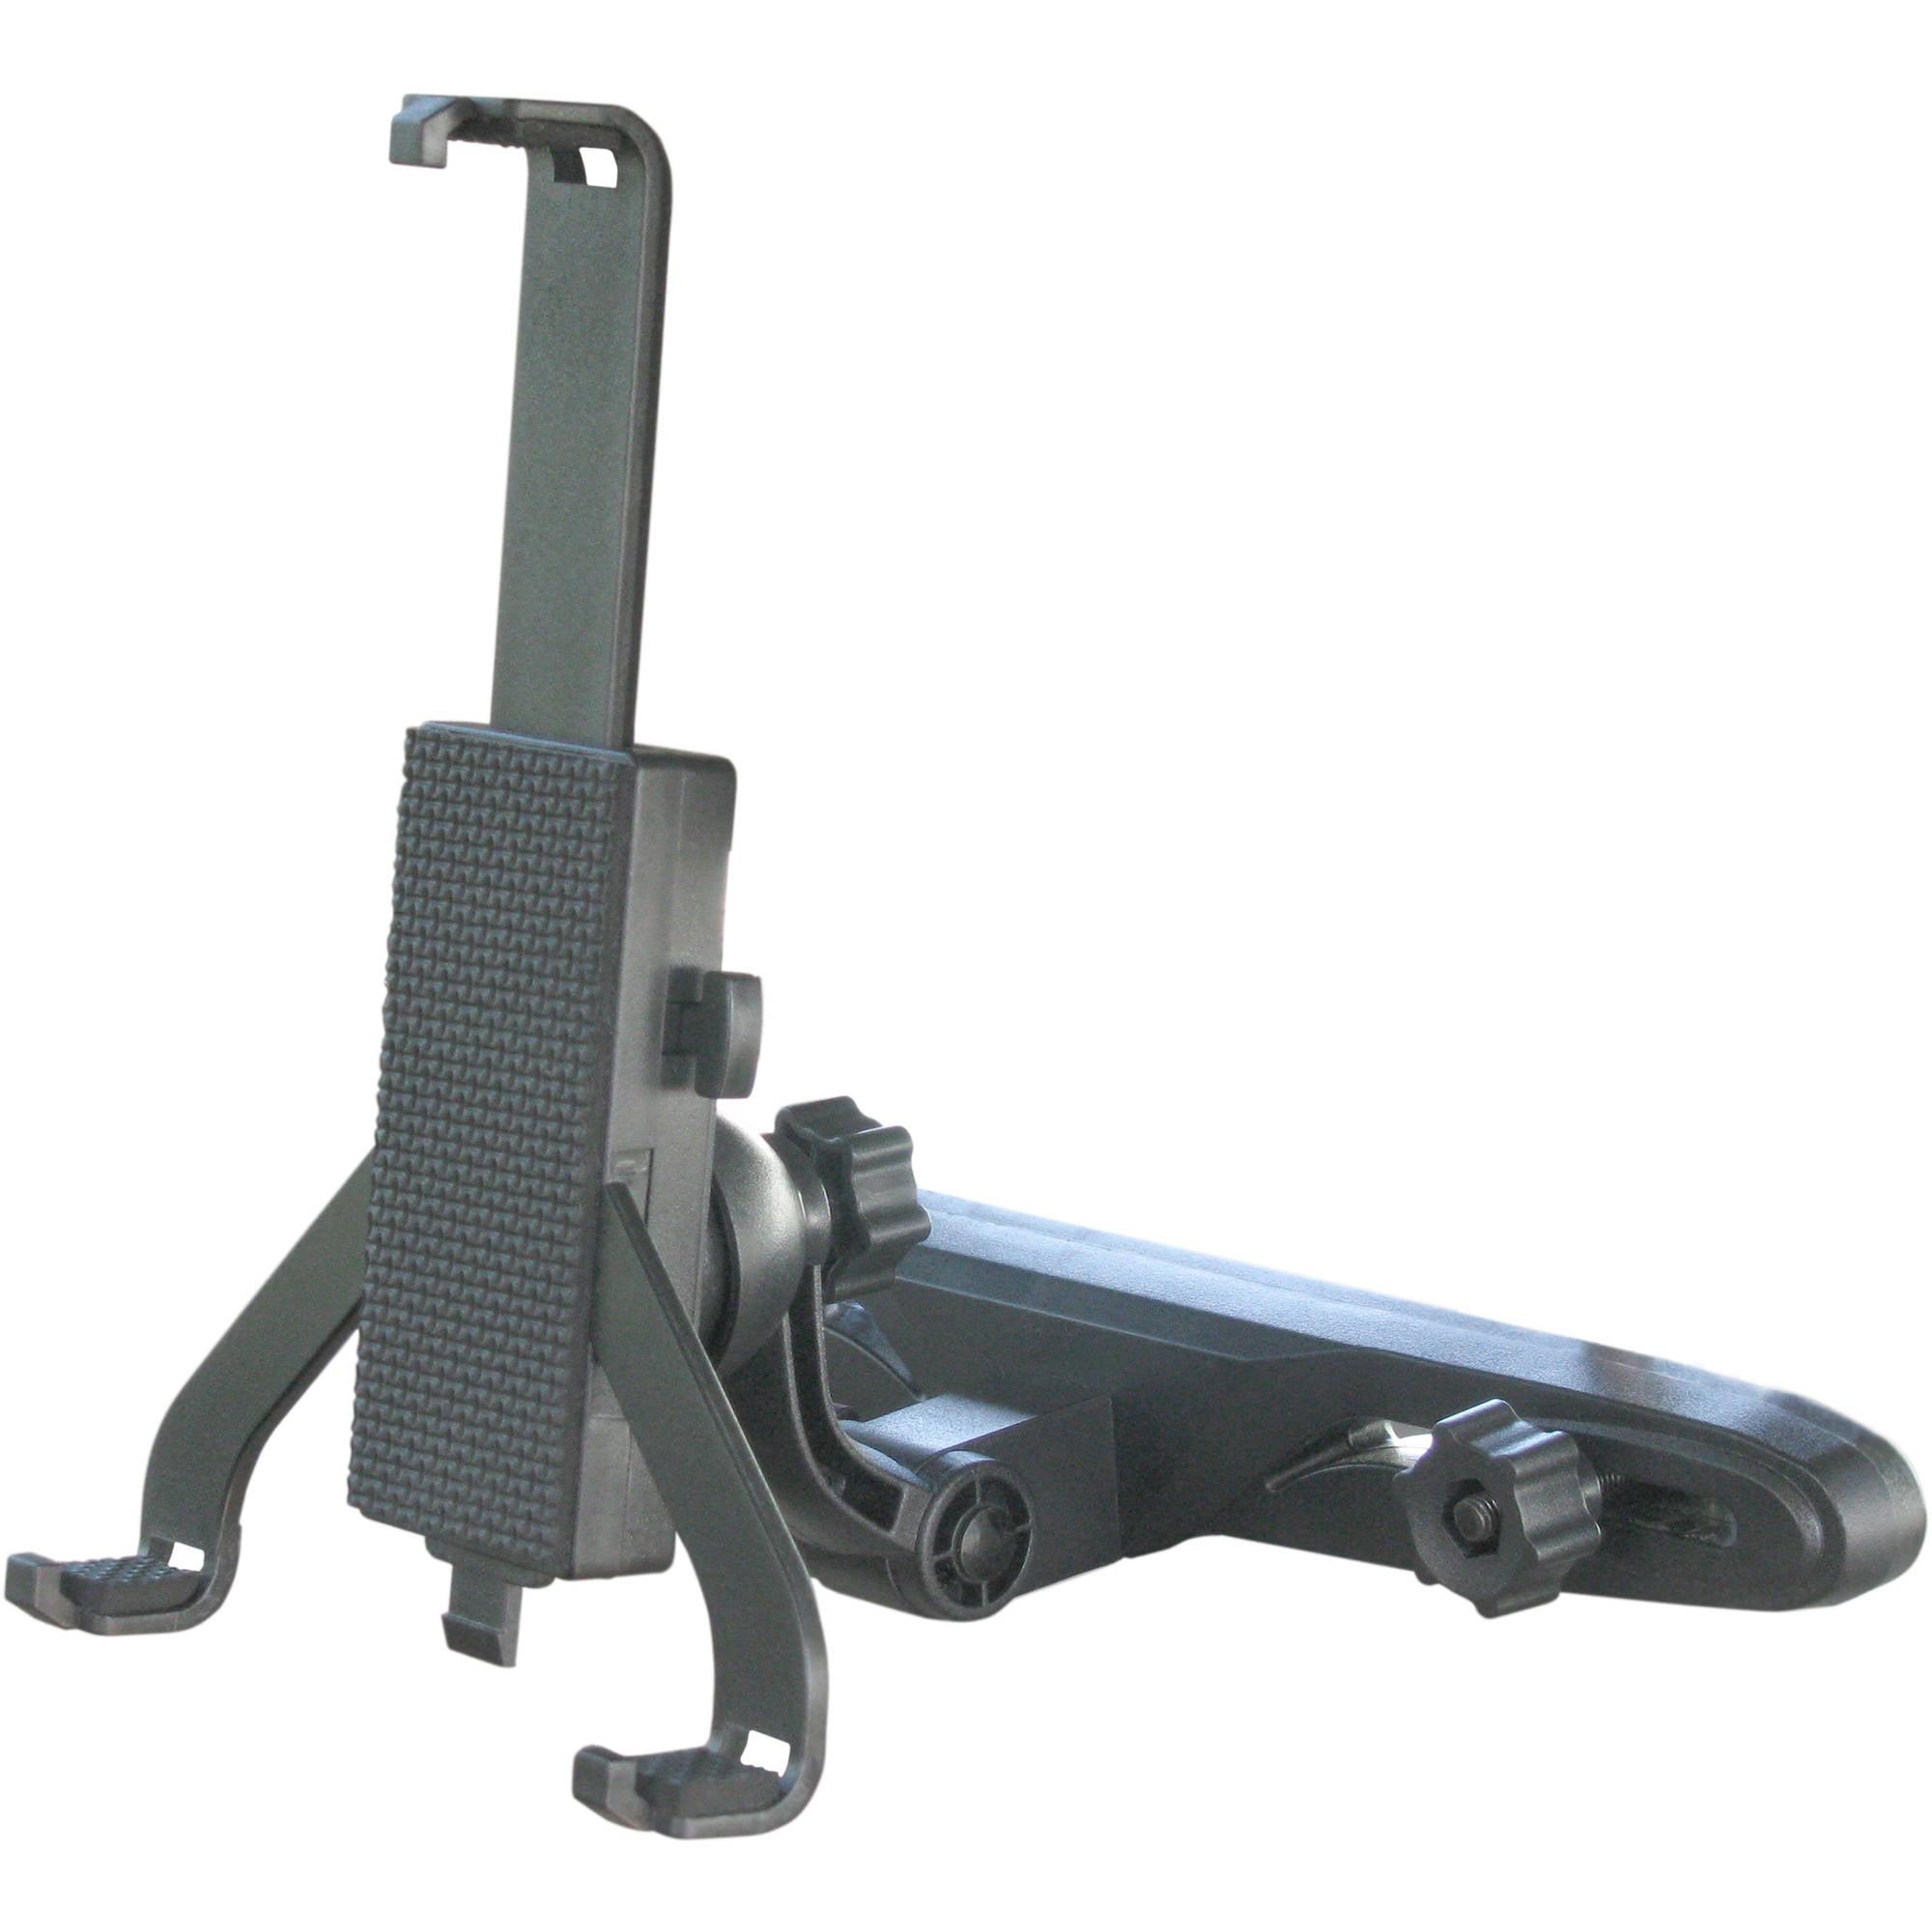 CommuteMate Headrest Tablet Mount